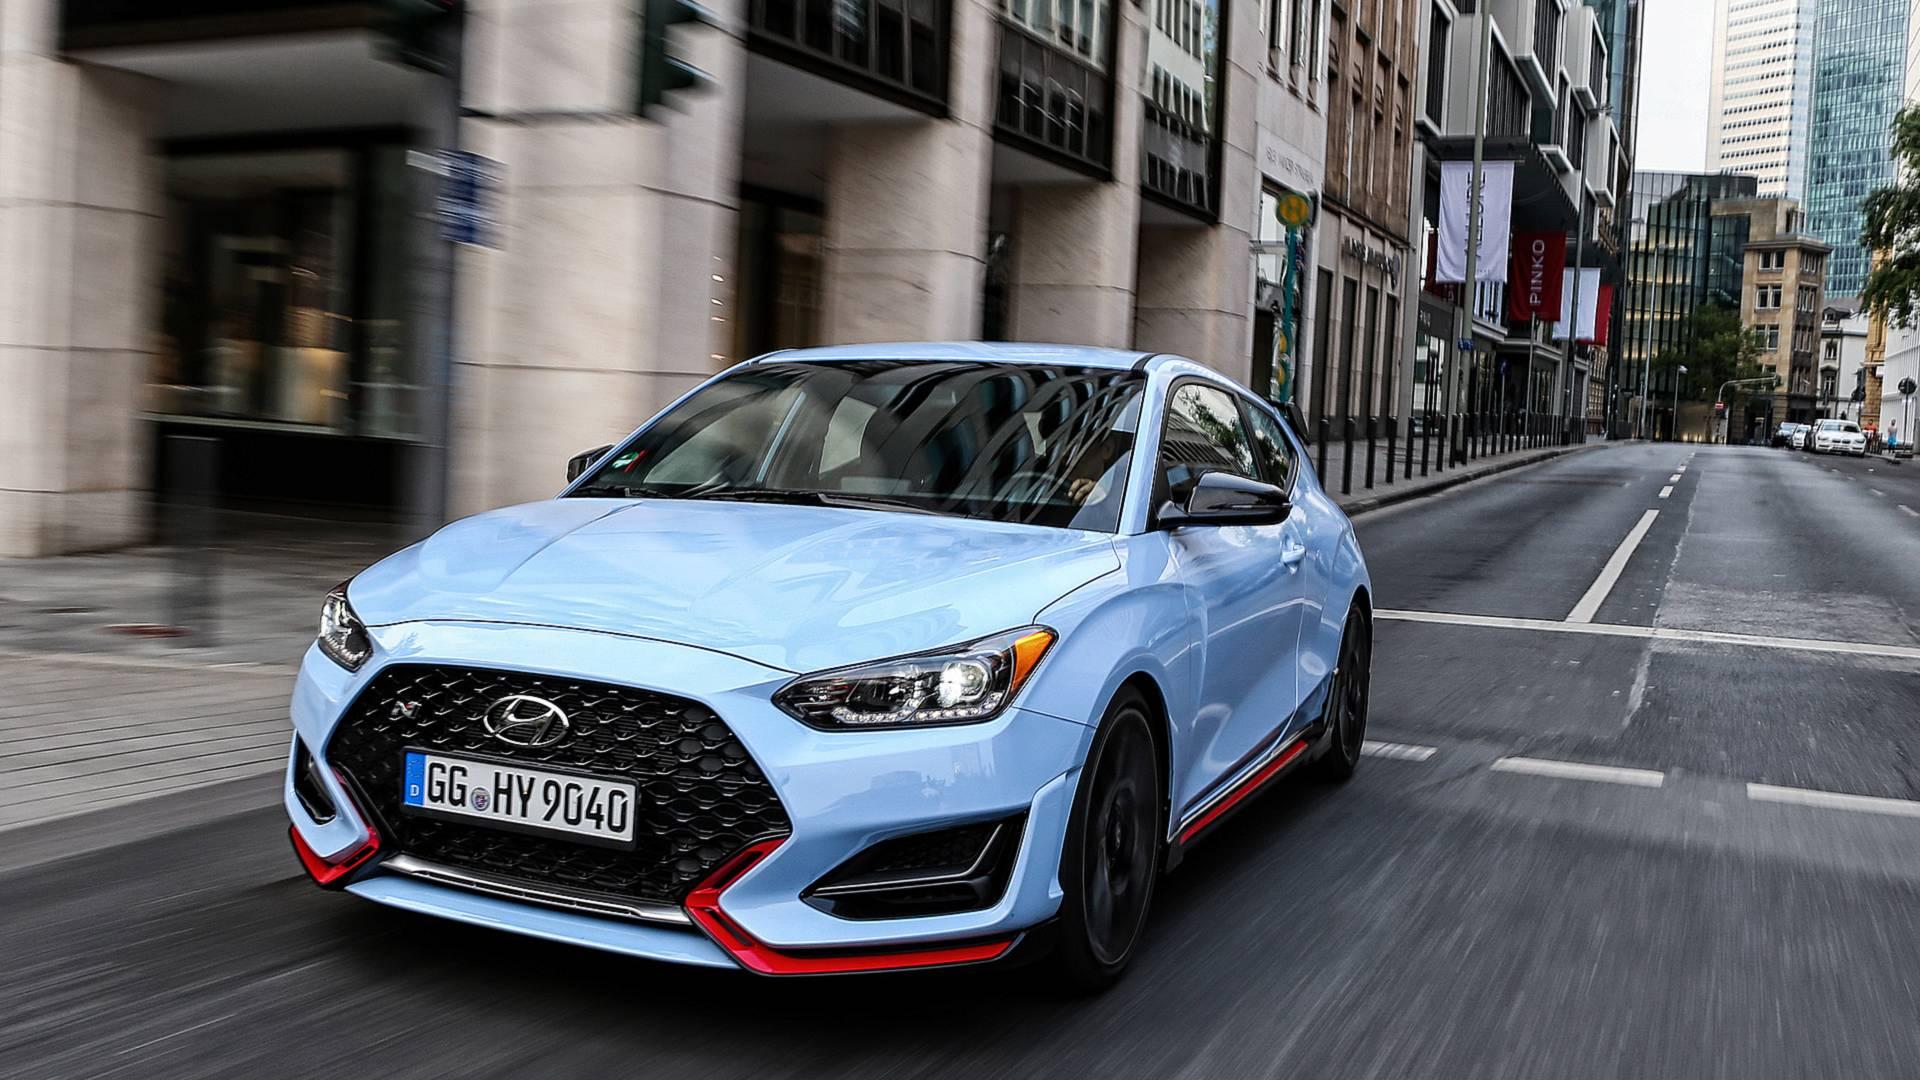 Hyundai Veloster N Priced Under $30k With 275 HP